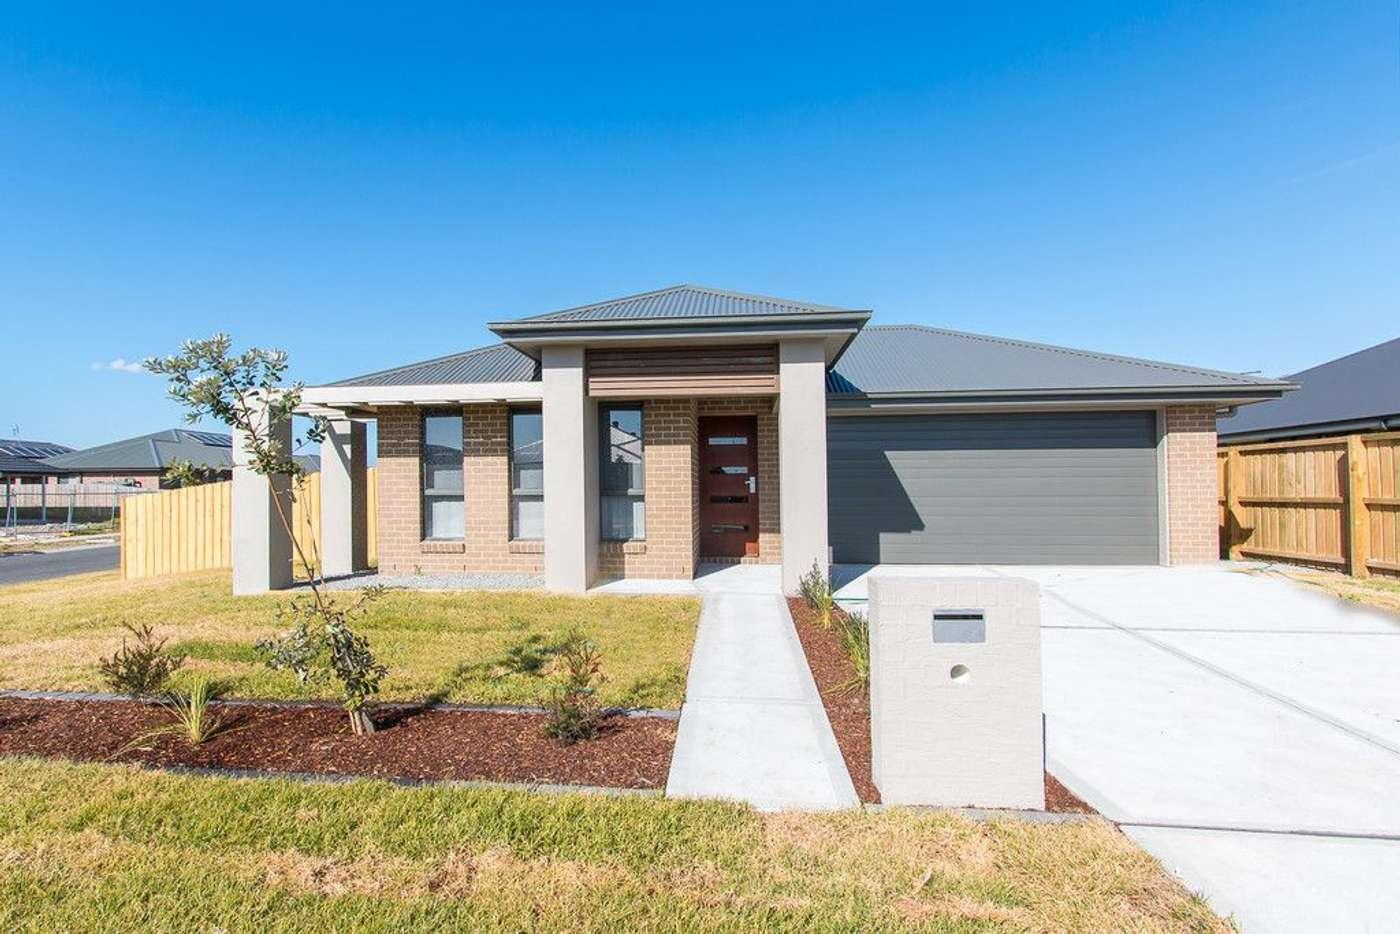 Main view of Homely house listing, 11 McNamara Street, Thornton NSW 2322